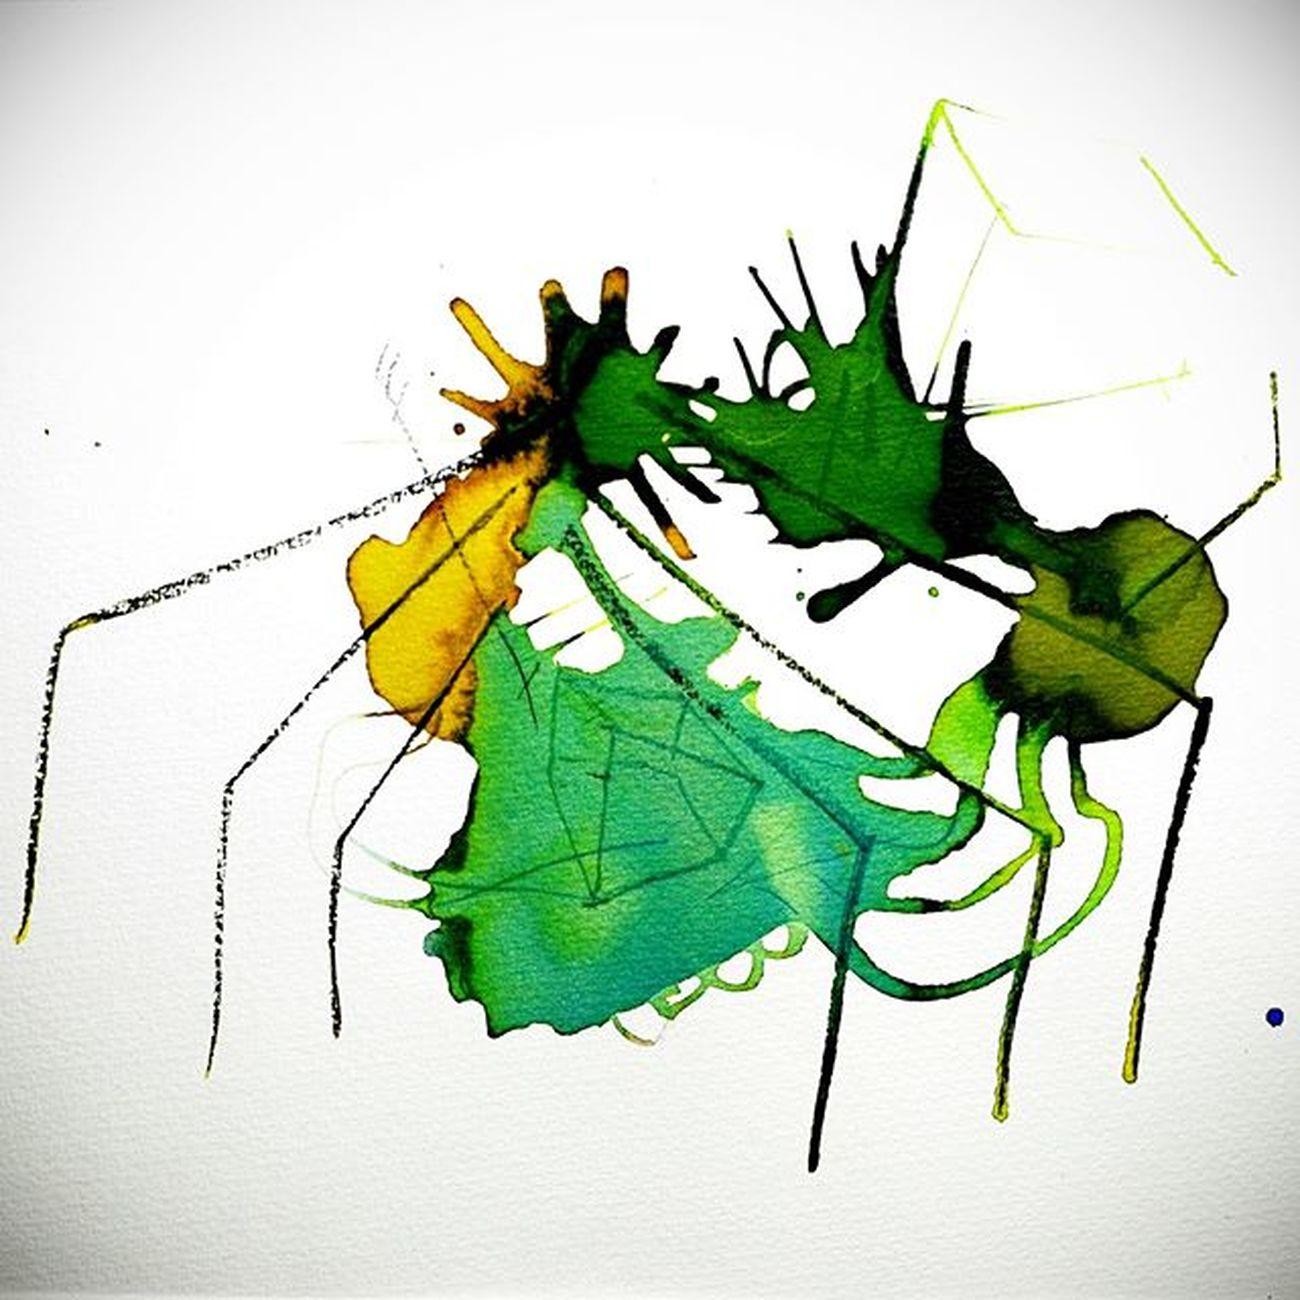 Thebeatles Abstractarts Mercedes Artamazing Coolpainting Modernart Abstractexpressionism Moma Museumofmodernart Modernart Drawing Artmuseum Contemporaryart Internationalart Artexhibition Artexhibit Basquiat Abstract Abstractart Ferrari Abstractartist Abstraction Abstractdrawing artbaselHrgiger realestatequotequoteofthedaywordsofwisdomfashionlove